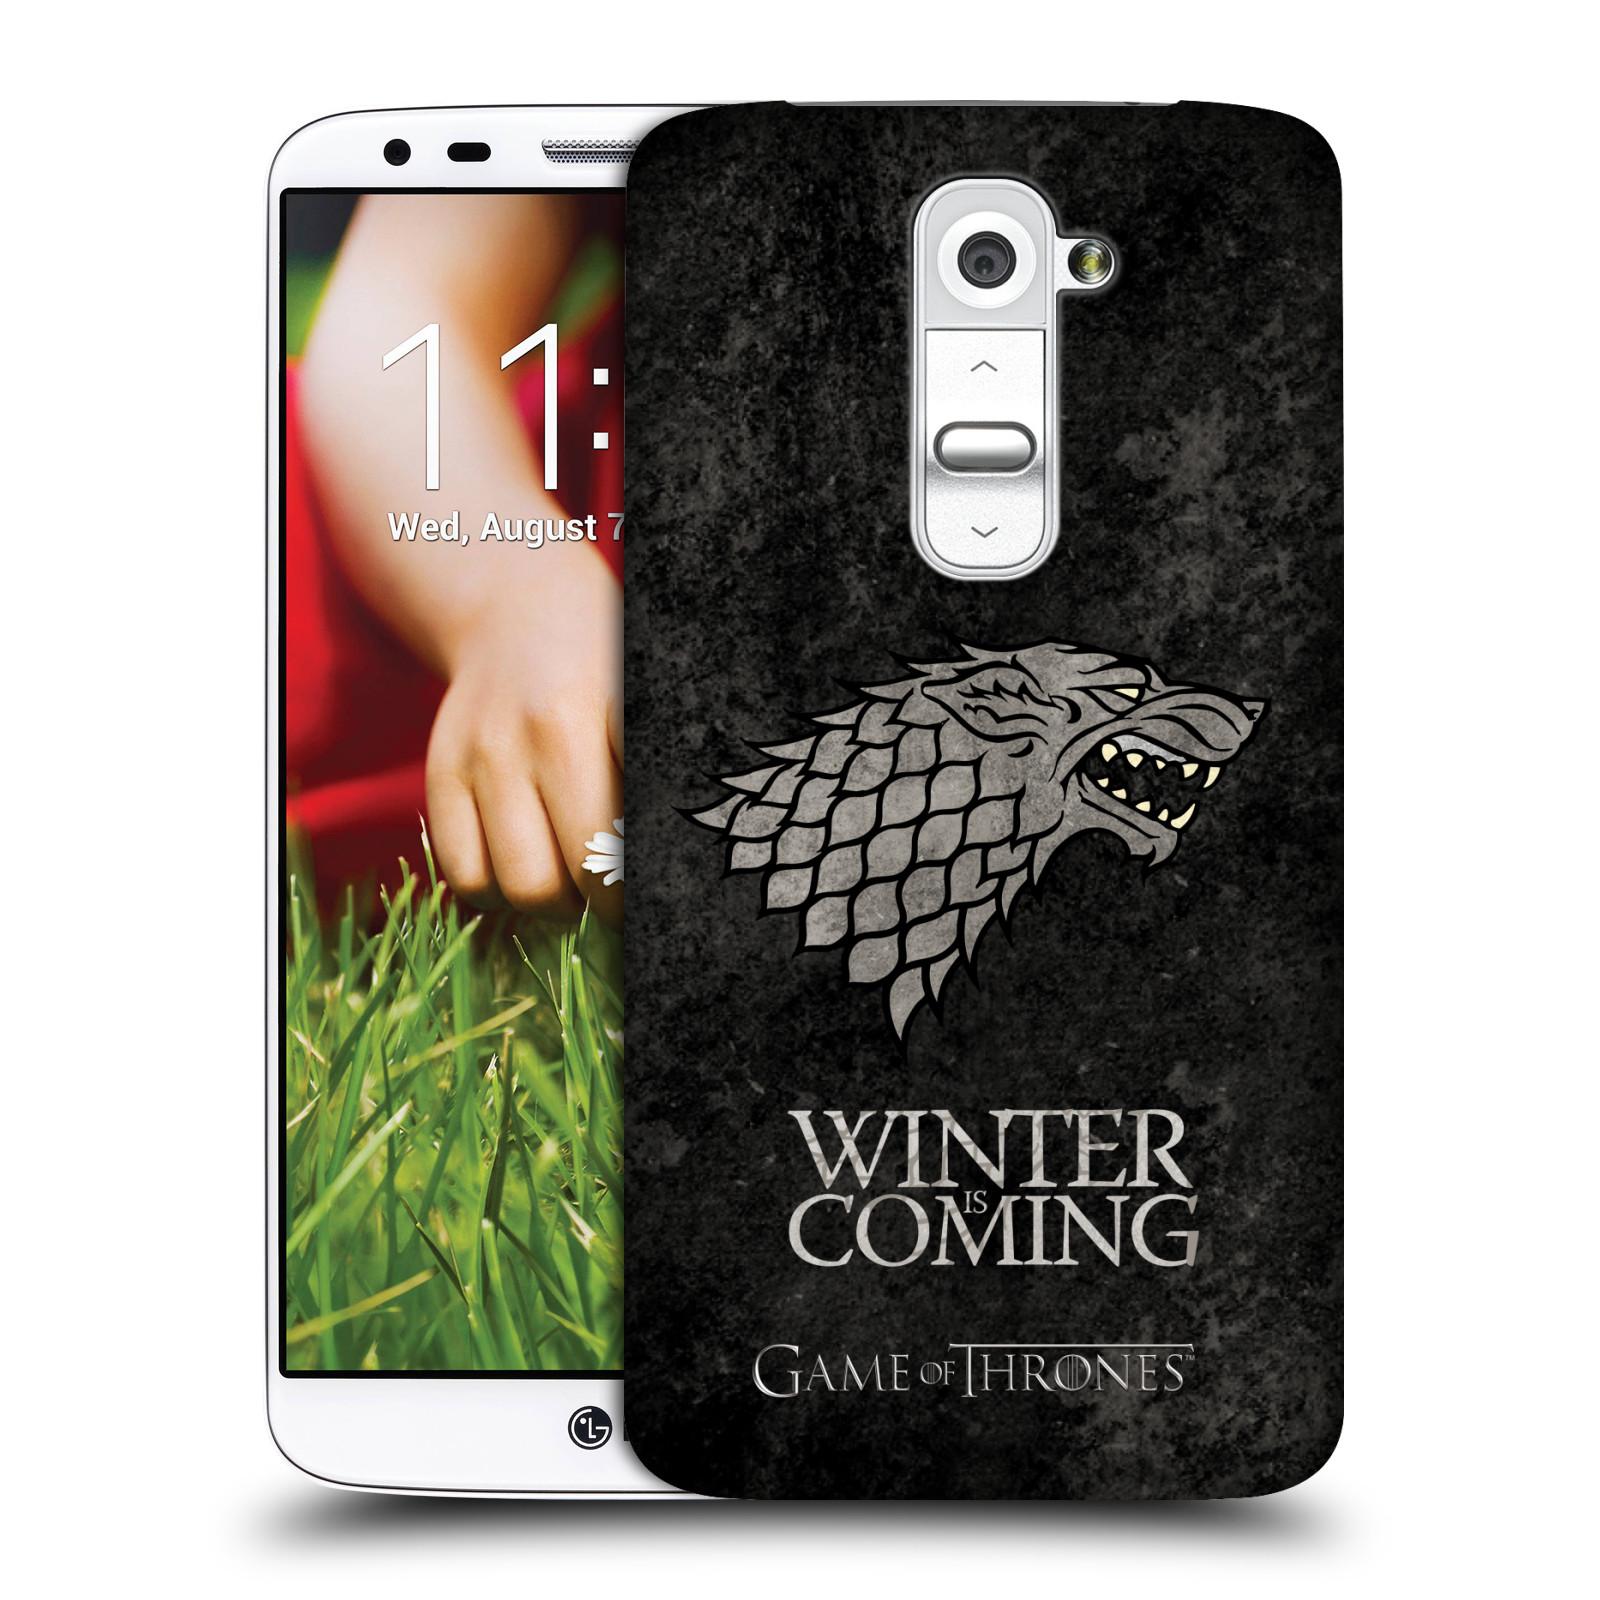 Plastové pouzdro na mobil LG G2 HEAD CASE Hra o trůny - Stark - Winter is coming